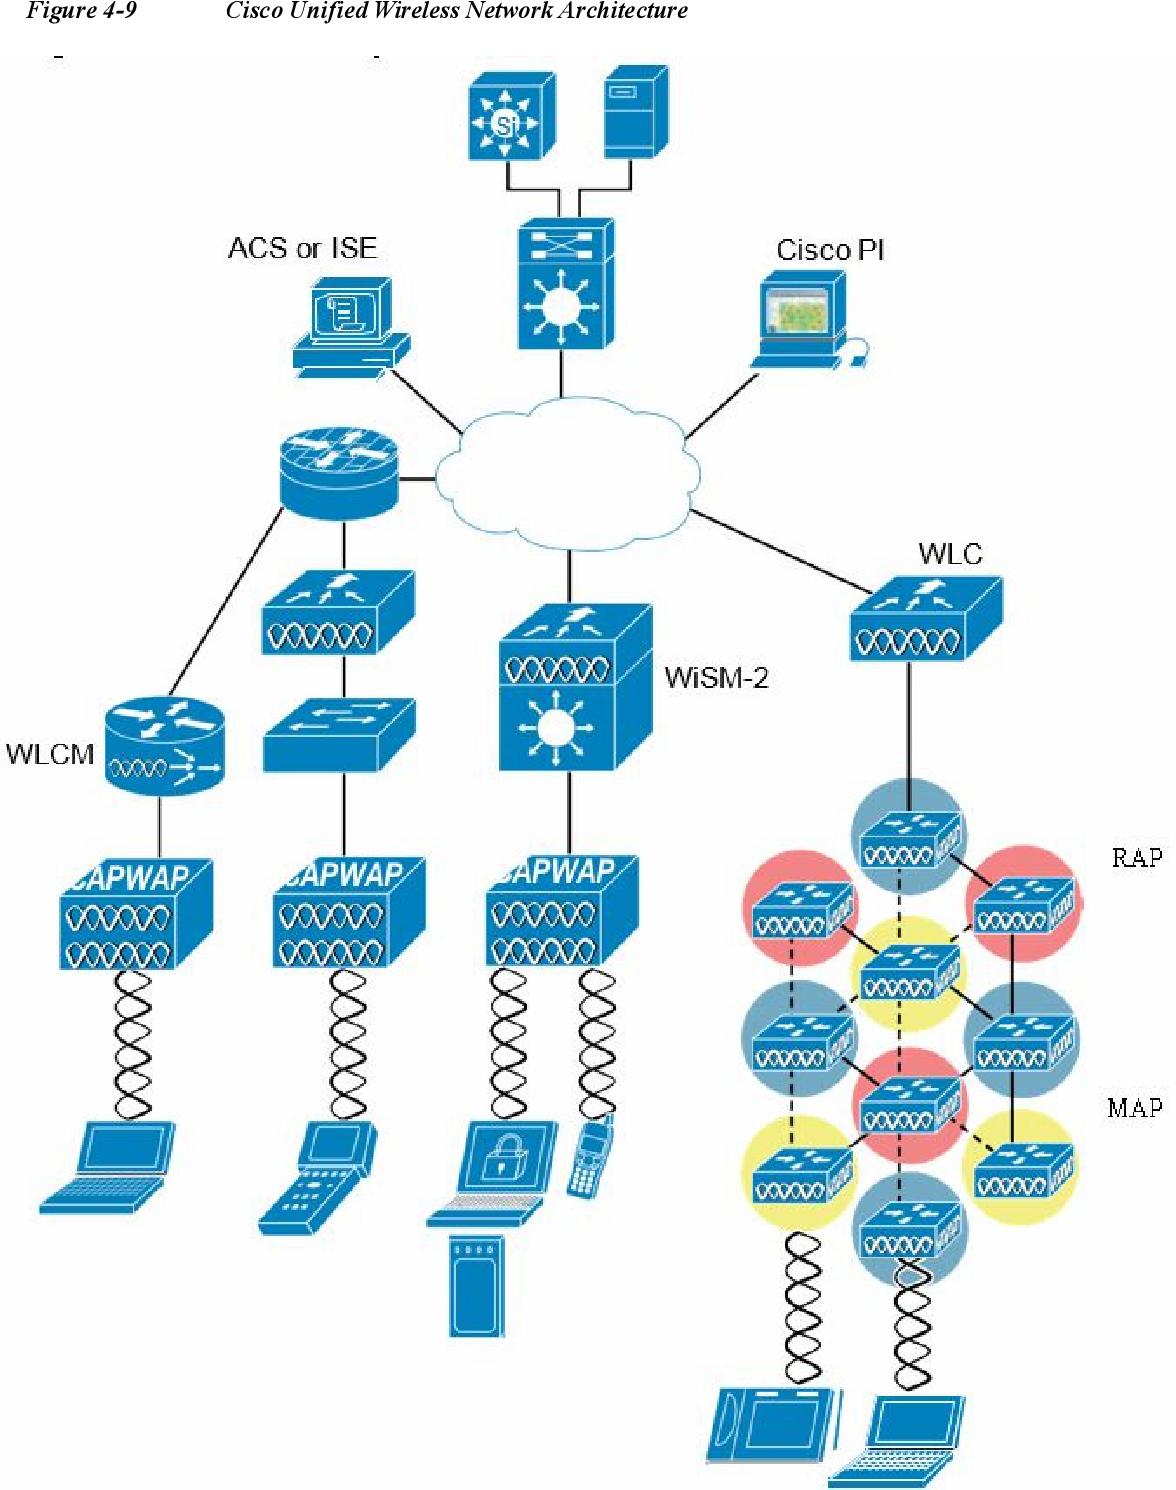 [DIAGRAM_1JK]  PDF] Cisco Unified Wireless Network Architecture—Base Security Features    Semantic Scholar   Wireless Network Architecture Diagram      Semantic Scholar